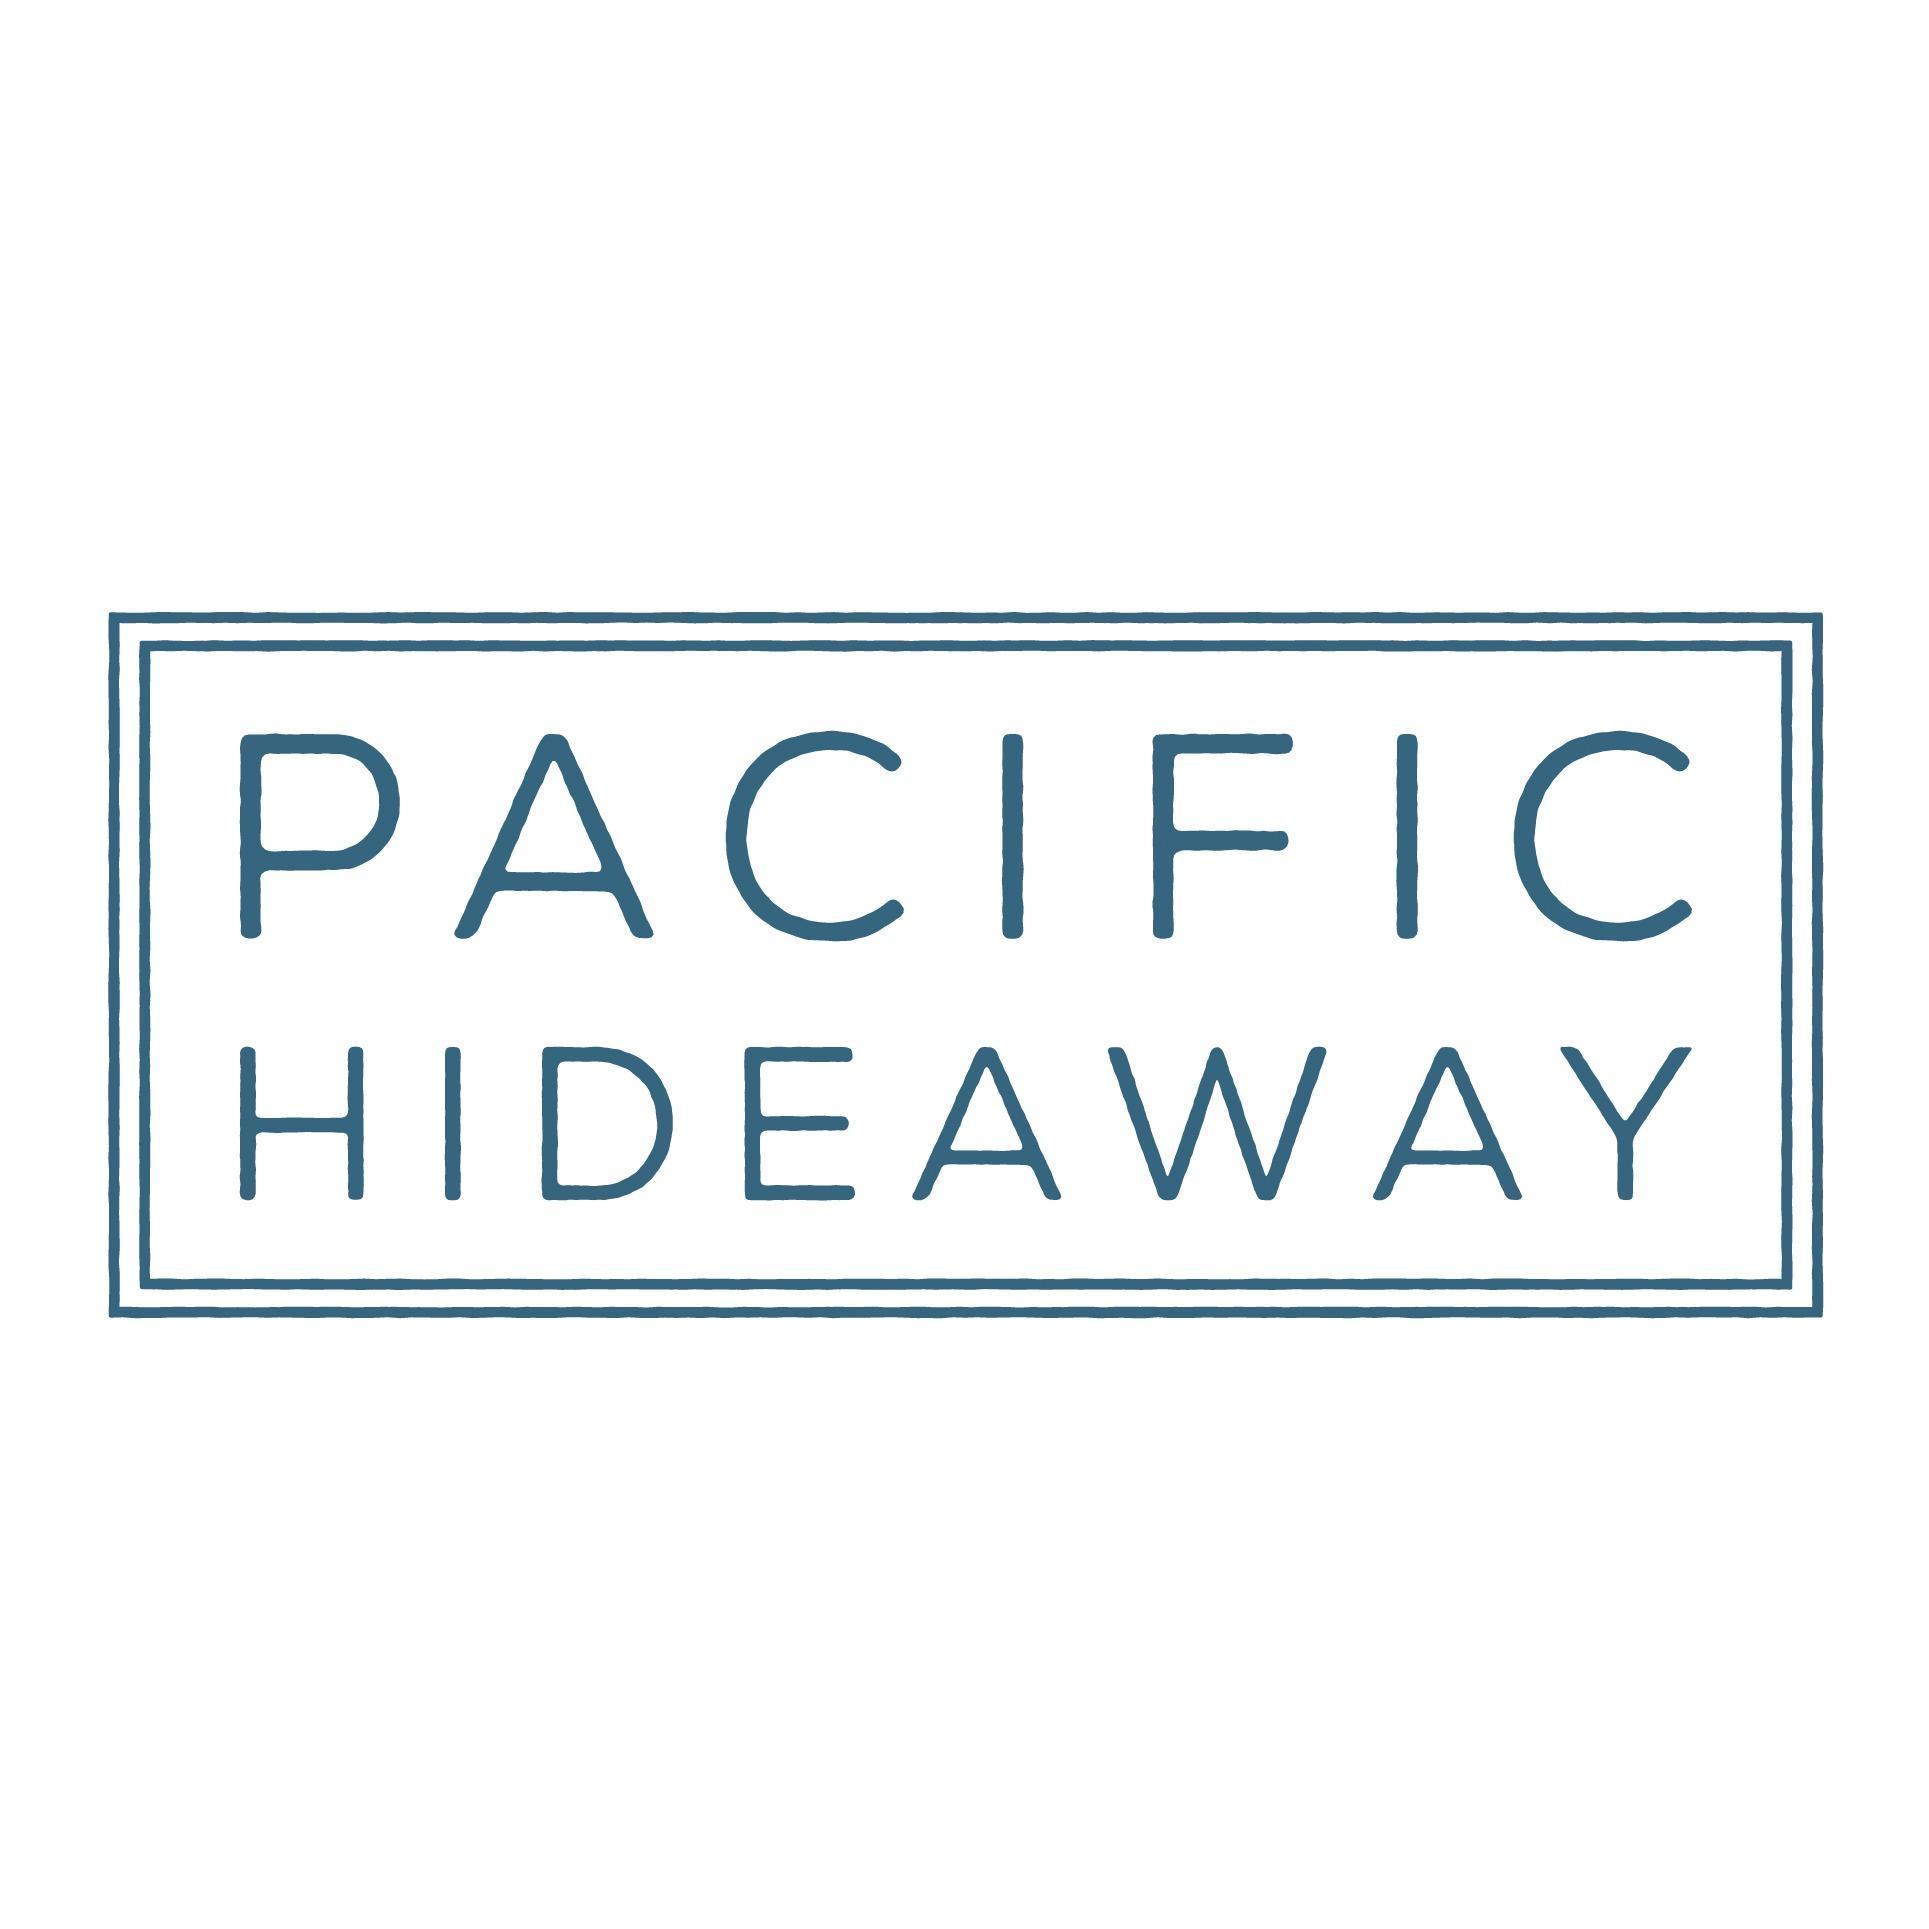 Pacific Hideaway